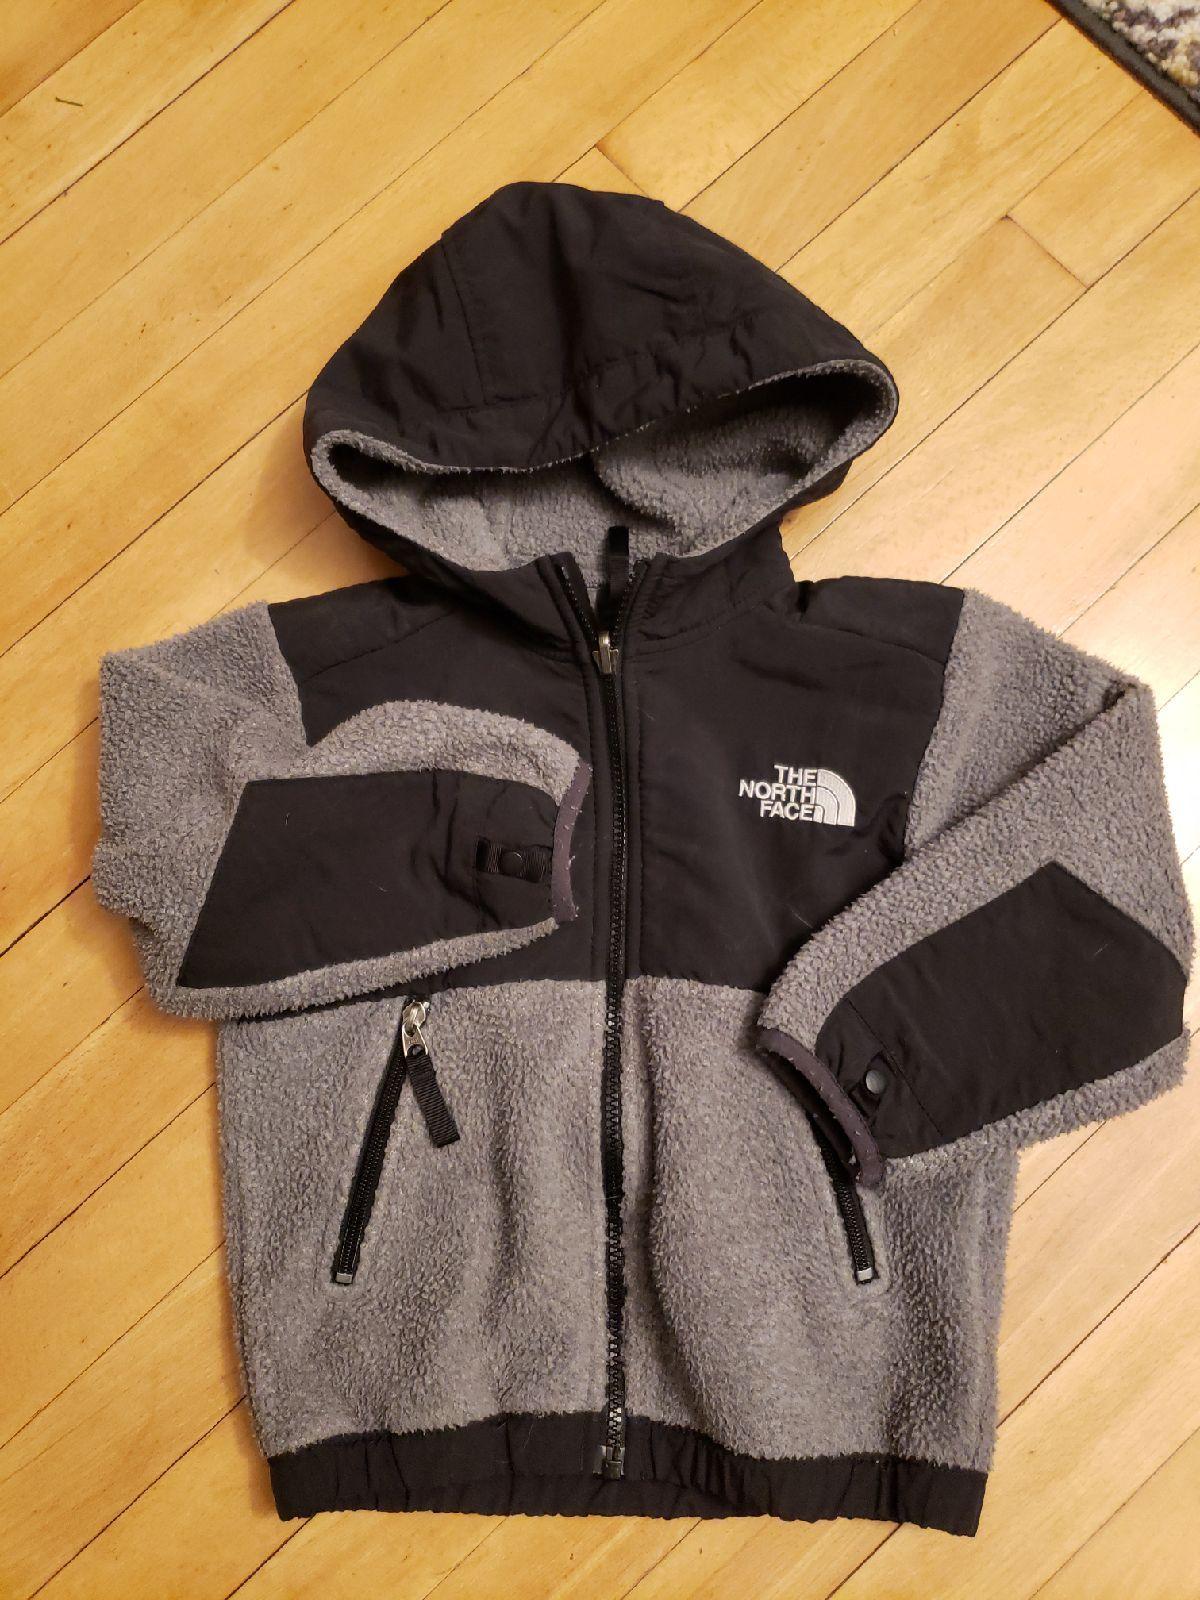 The North Face Fleece Size Xxs Grey Black The North Face North Face Jacket North Face Coat [ 1600 x 1200 Pixel ]